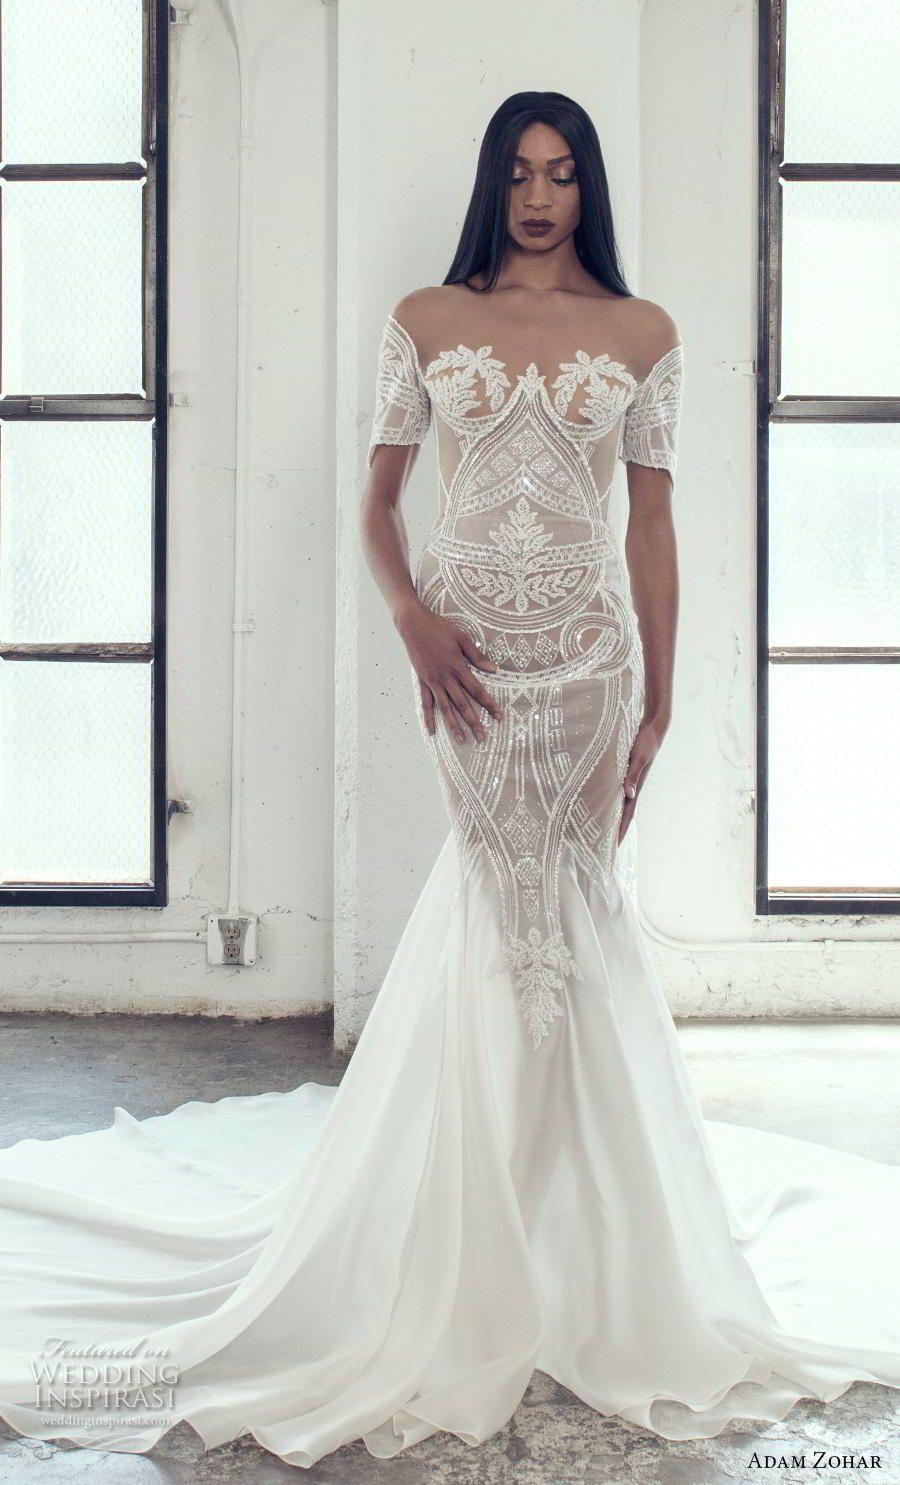 Cool Awesome Elegant Off The Shoulder White Lace Short Sleeve Mermaid Wedding Dress Size 4 20 2 Wedding Dresses Short Sleeve Wedding Dress Wedding Dresses Ebay [ 1600 x 1240 Pixel ]